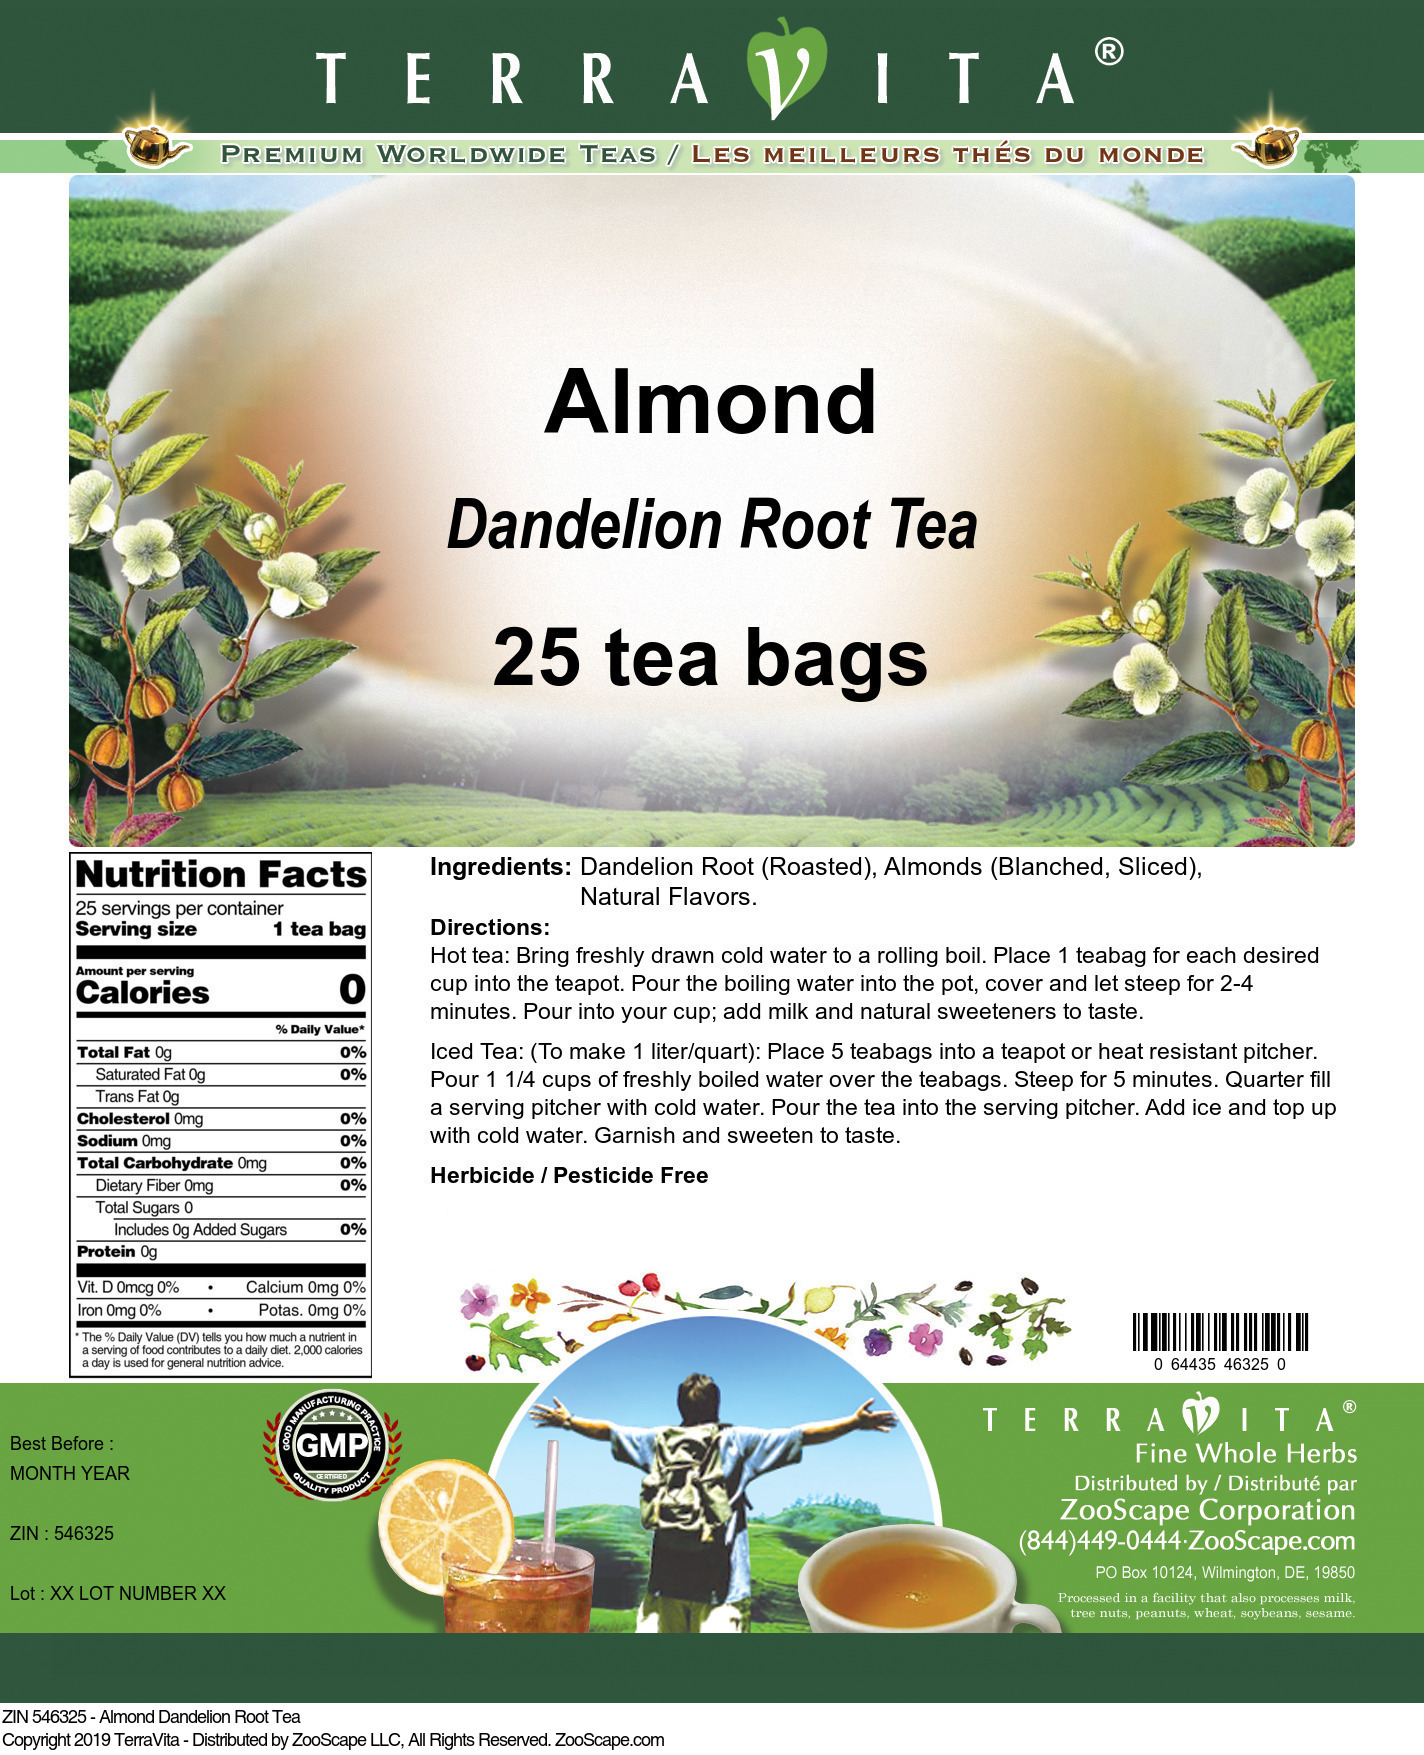 Almond Dandelion Root